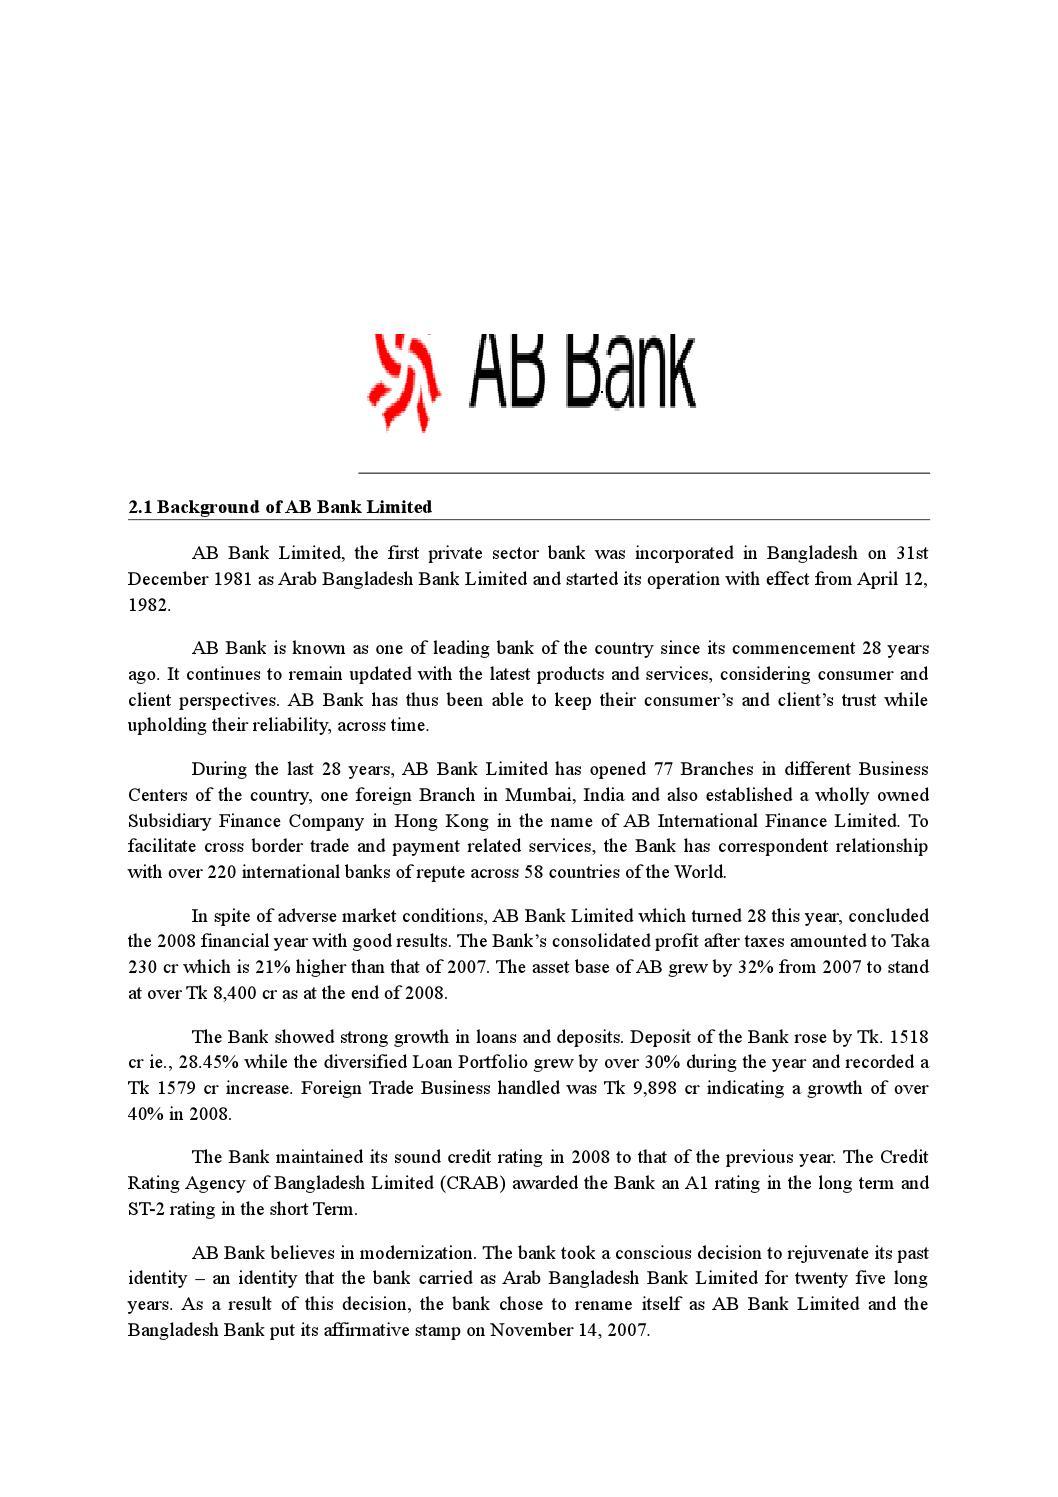 Nrb remittance in relation to general banking ab bank limited by nrb remittance in relation to general banking ab bank limited by md papon issuu altavistaventures Choice Image